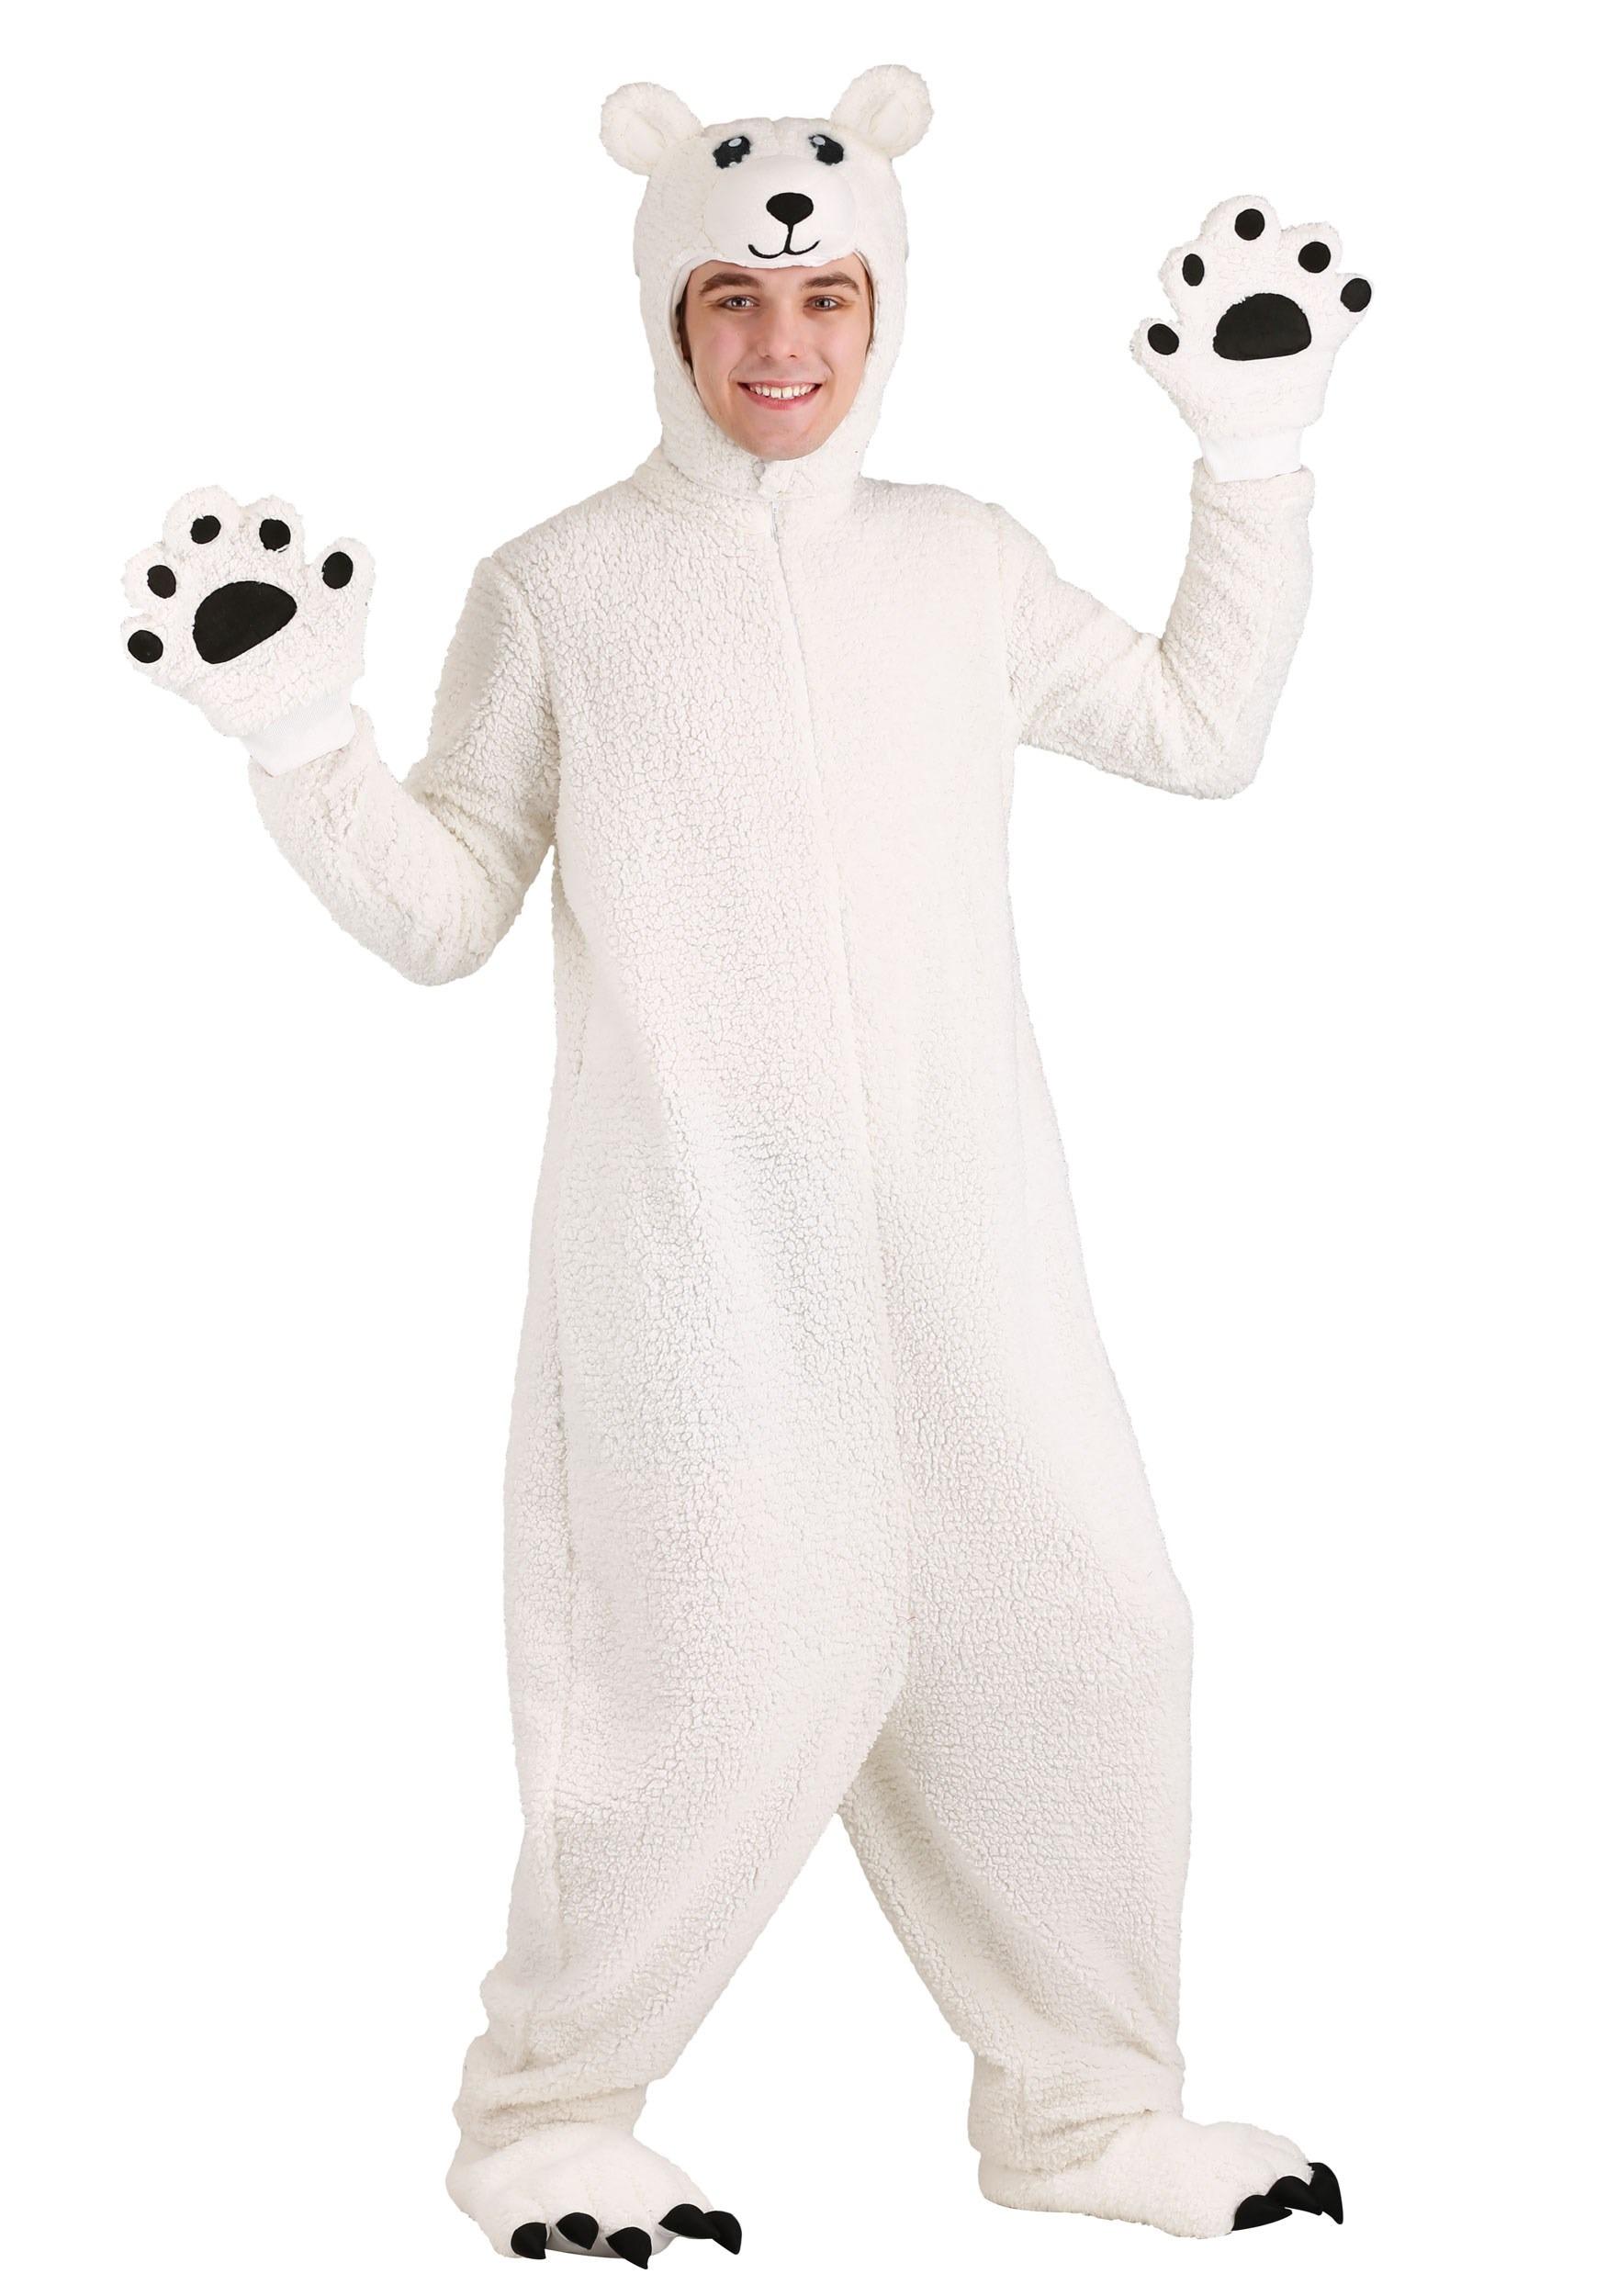 Arctic Polar Bear Costume for Adults